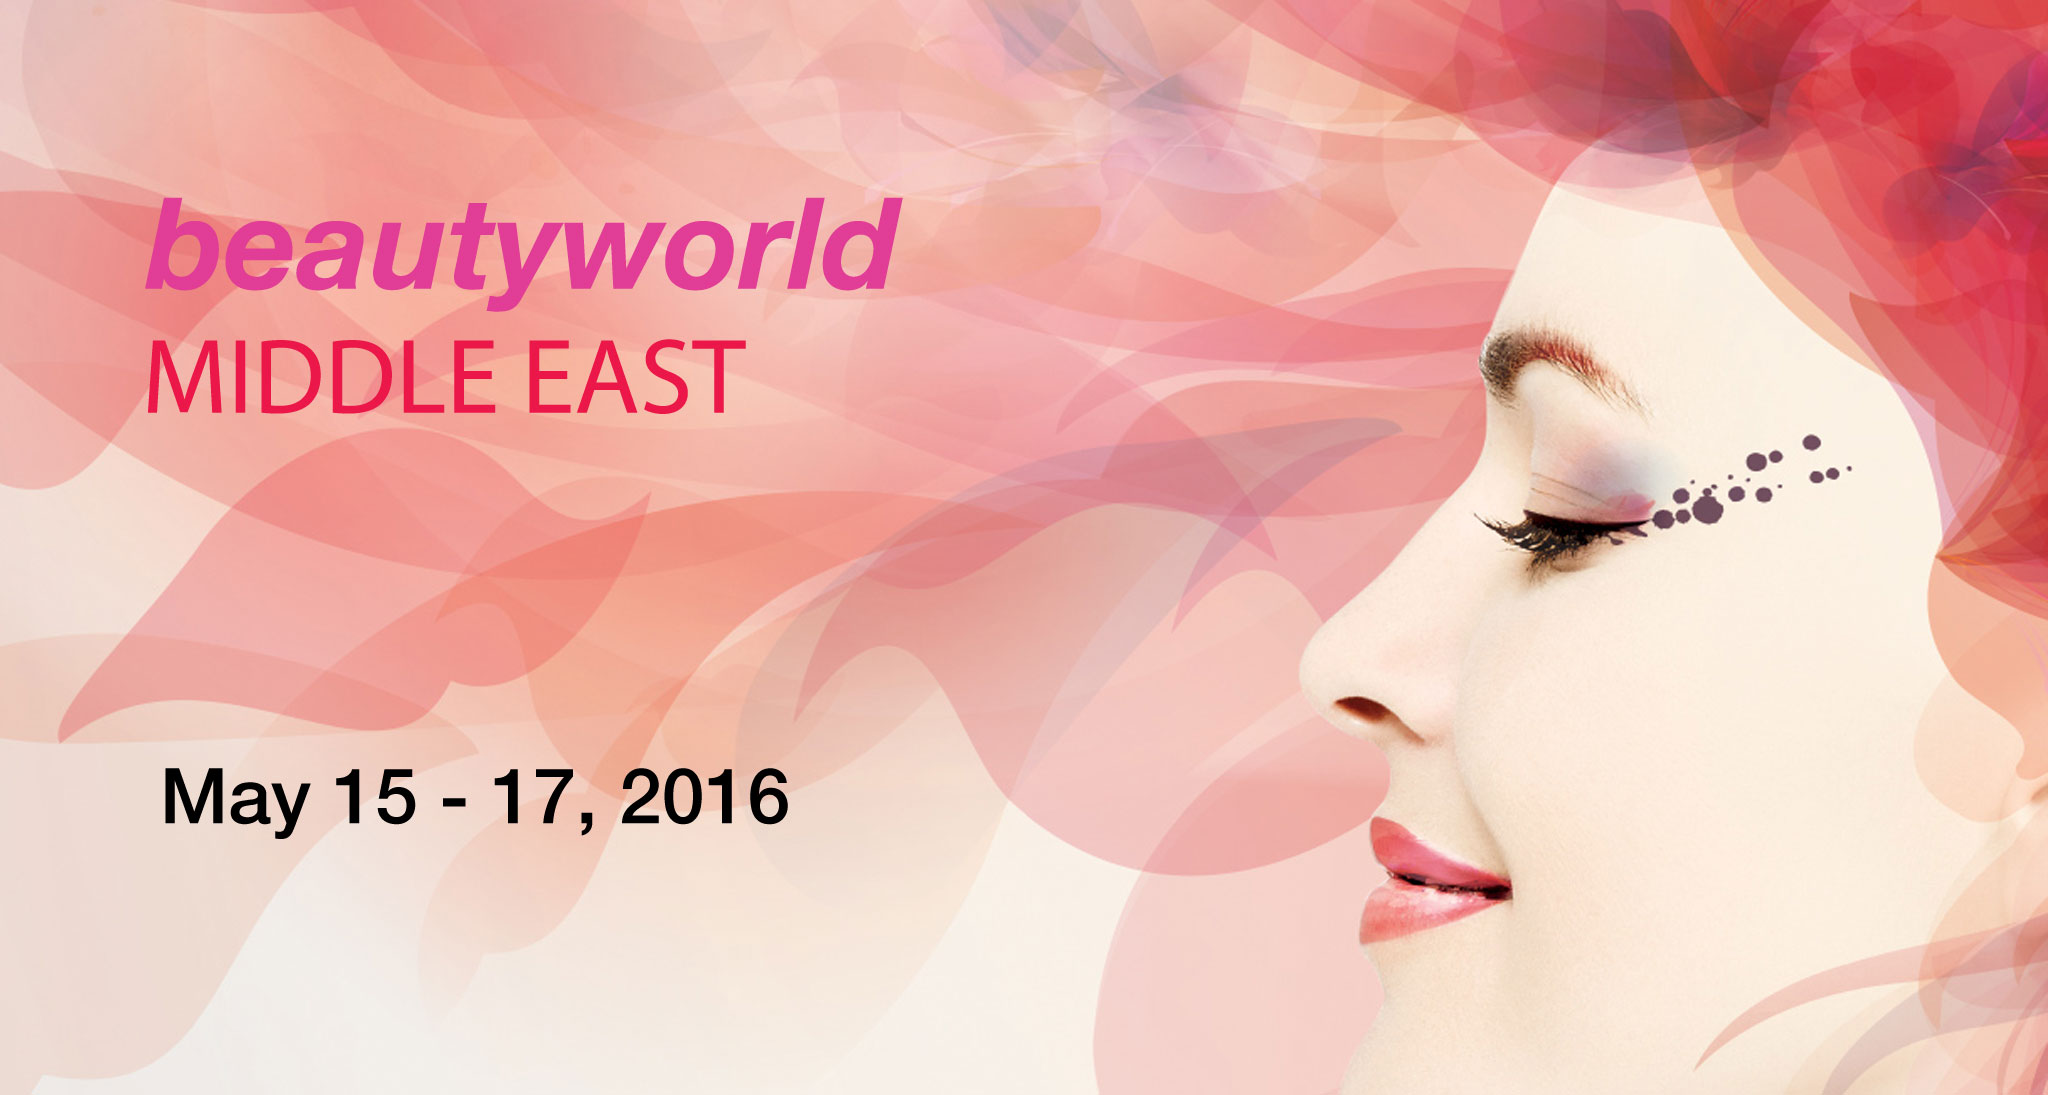 beautyworld middle east dubai almah scented jewelry